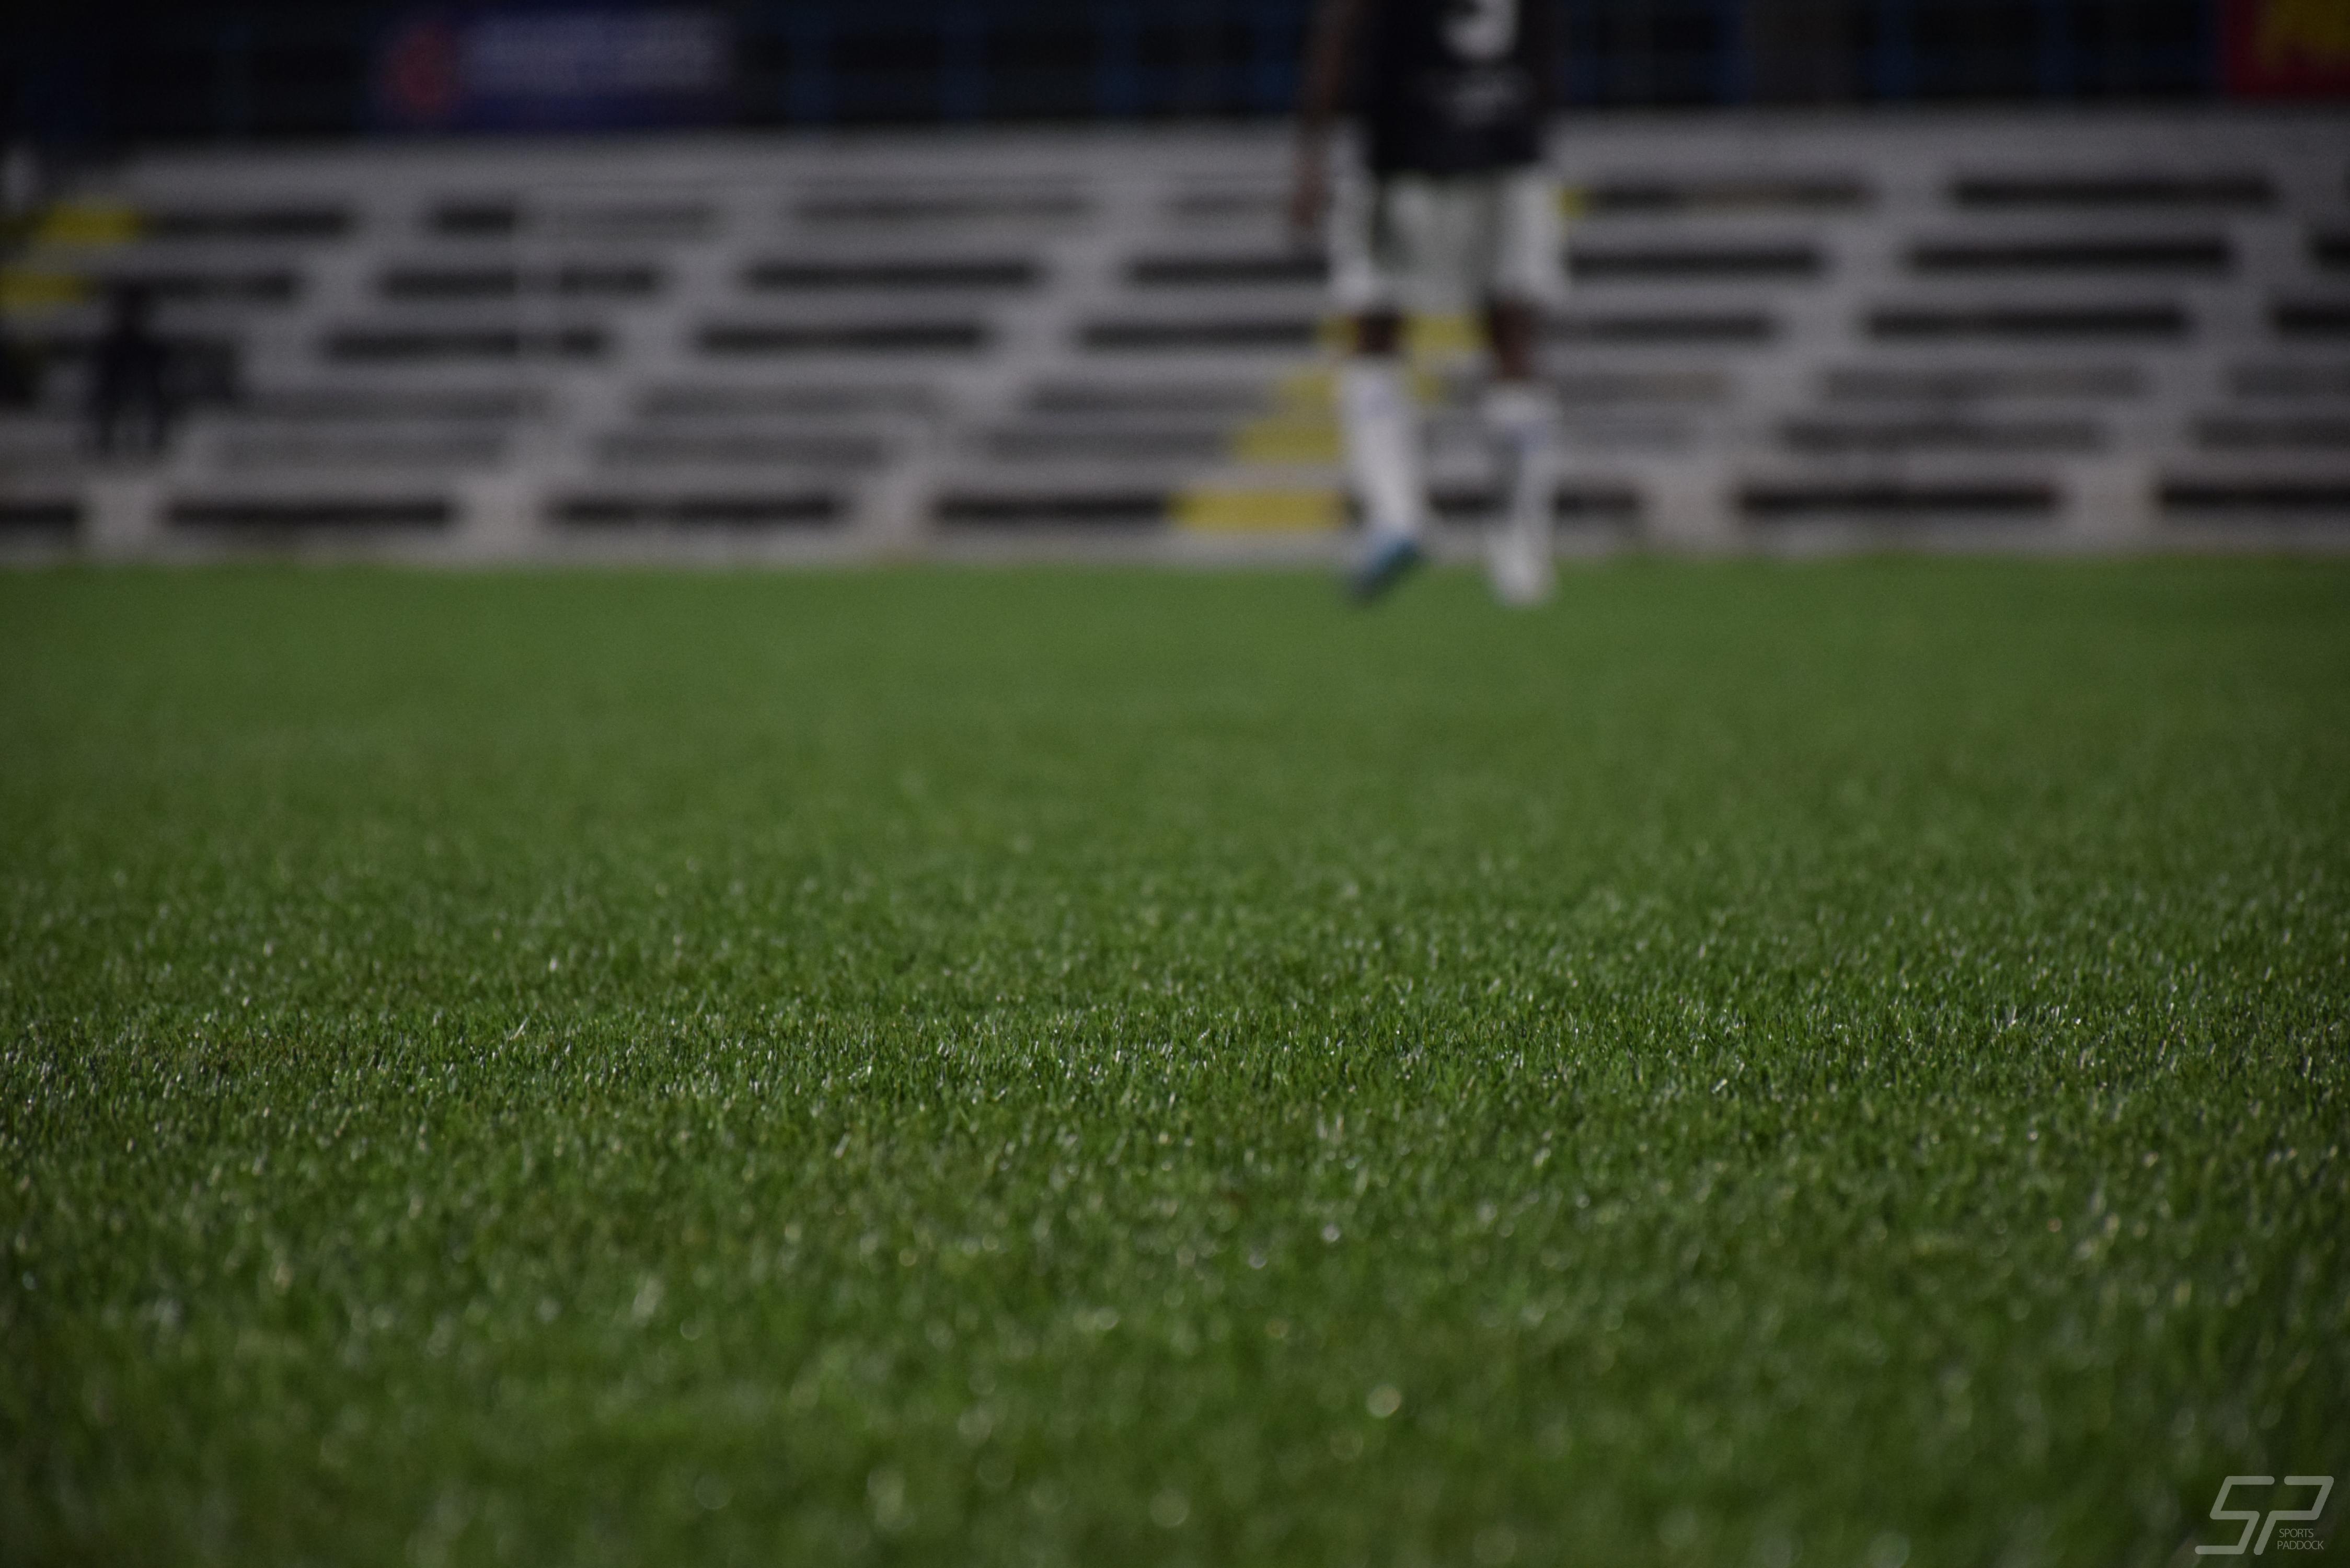 General 4496x3000 Football  grass soccer soccer field football stadium Football Boots soccer pitches photography